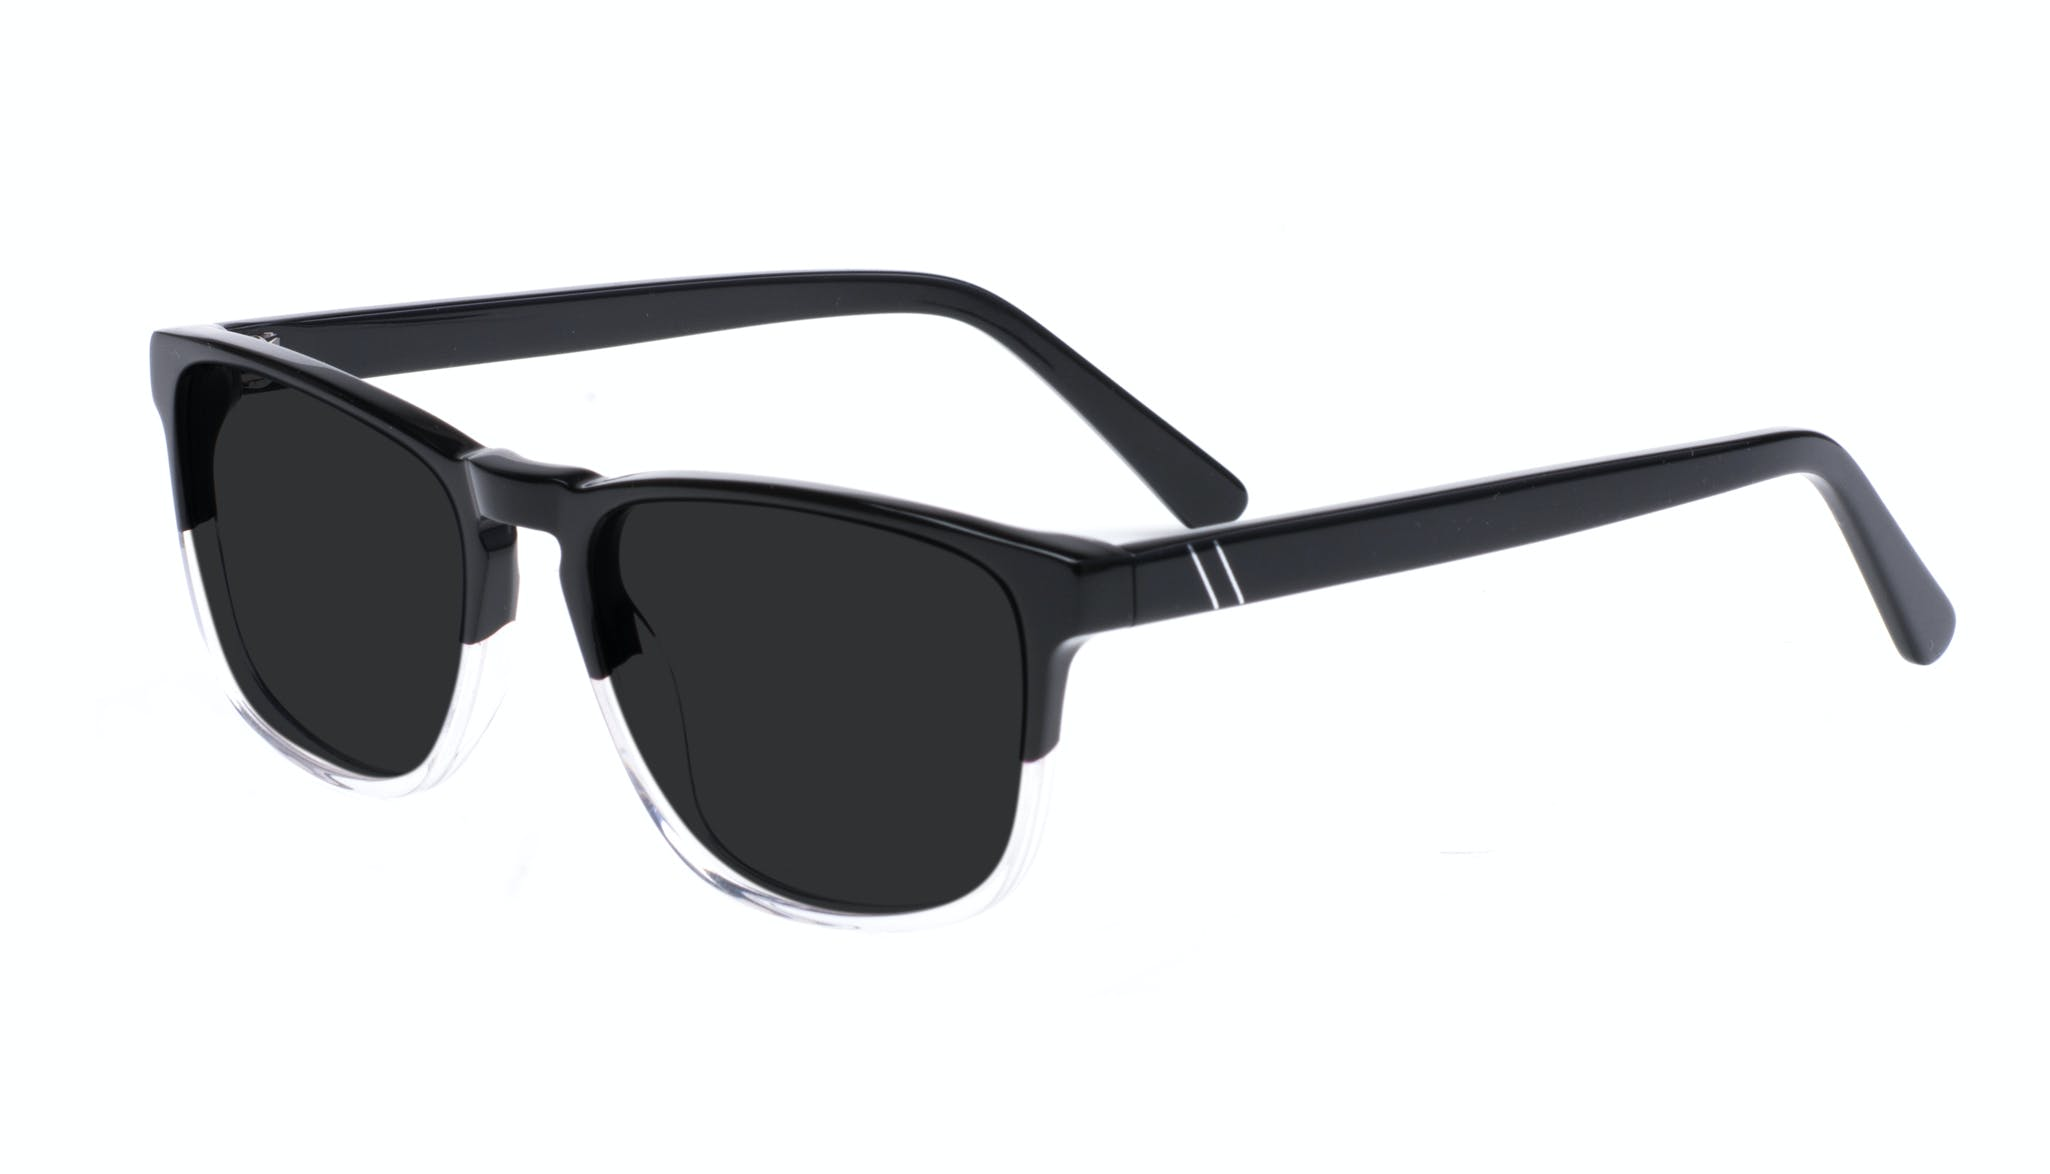 Affordable Fashion Glasses Rectangle Sunglasses Men Loft Black Diamond Tilt